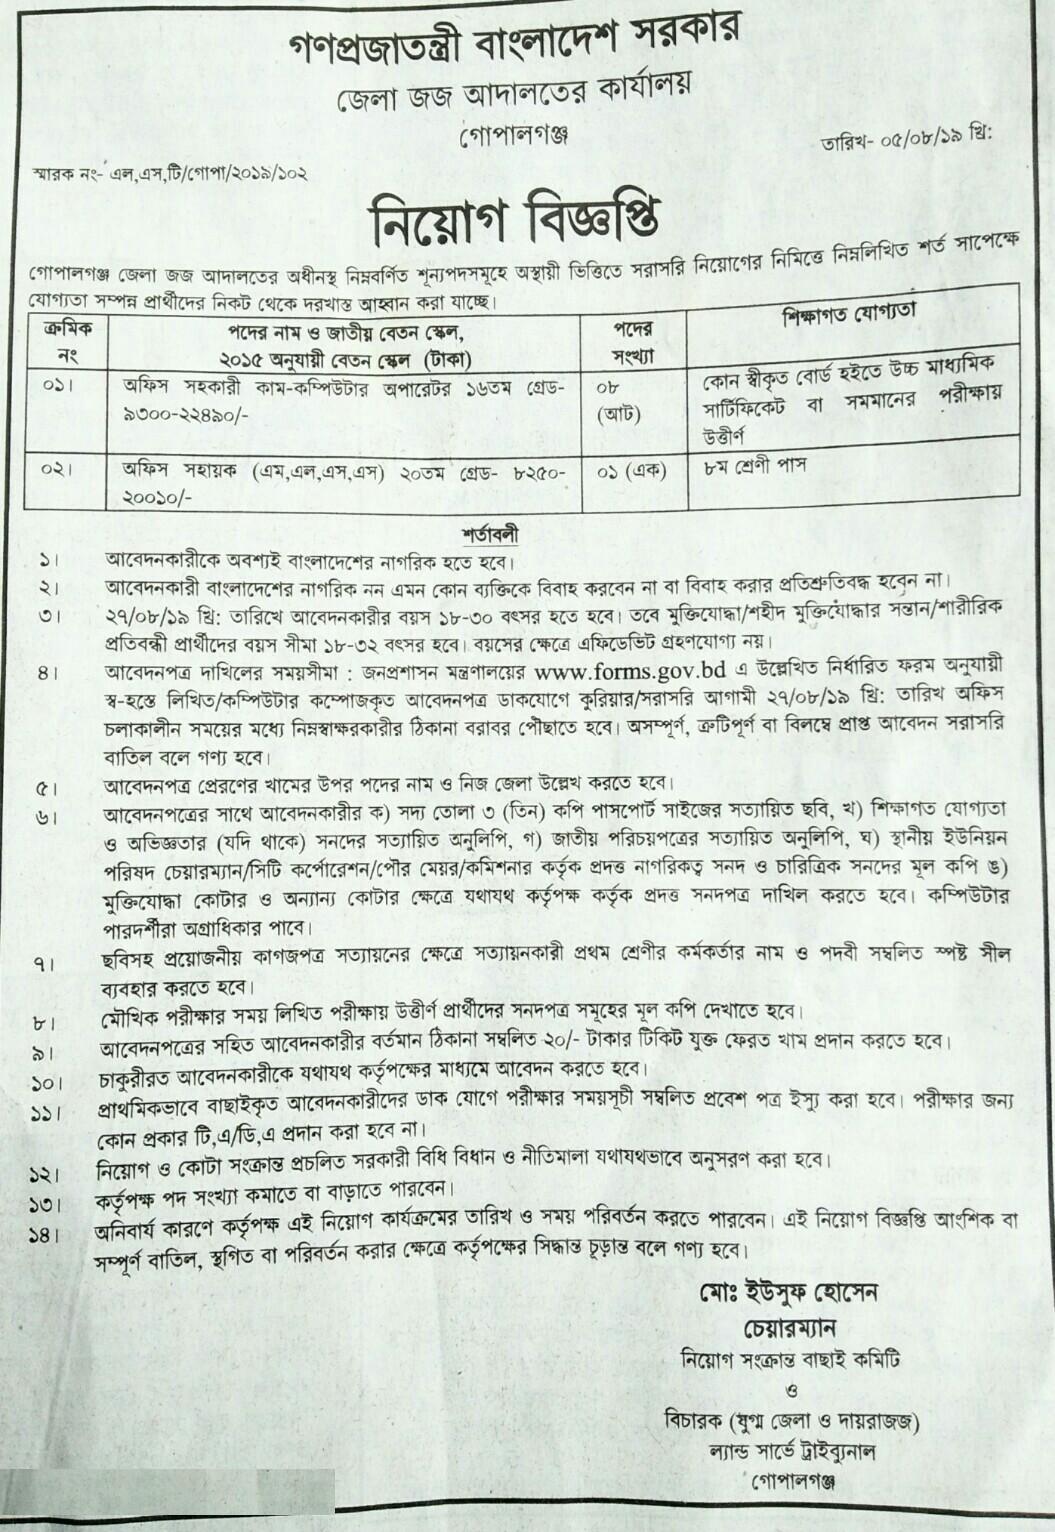 Gopalganj District Judge Court job circular 2019. গোপালগঞ্জ জেলা জজ আদালত নিয়োগ বিজ্ঞপ্তি ২০১৯